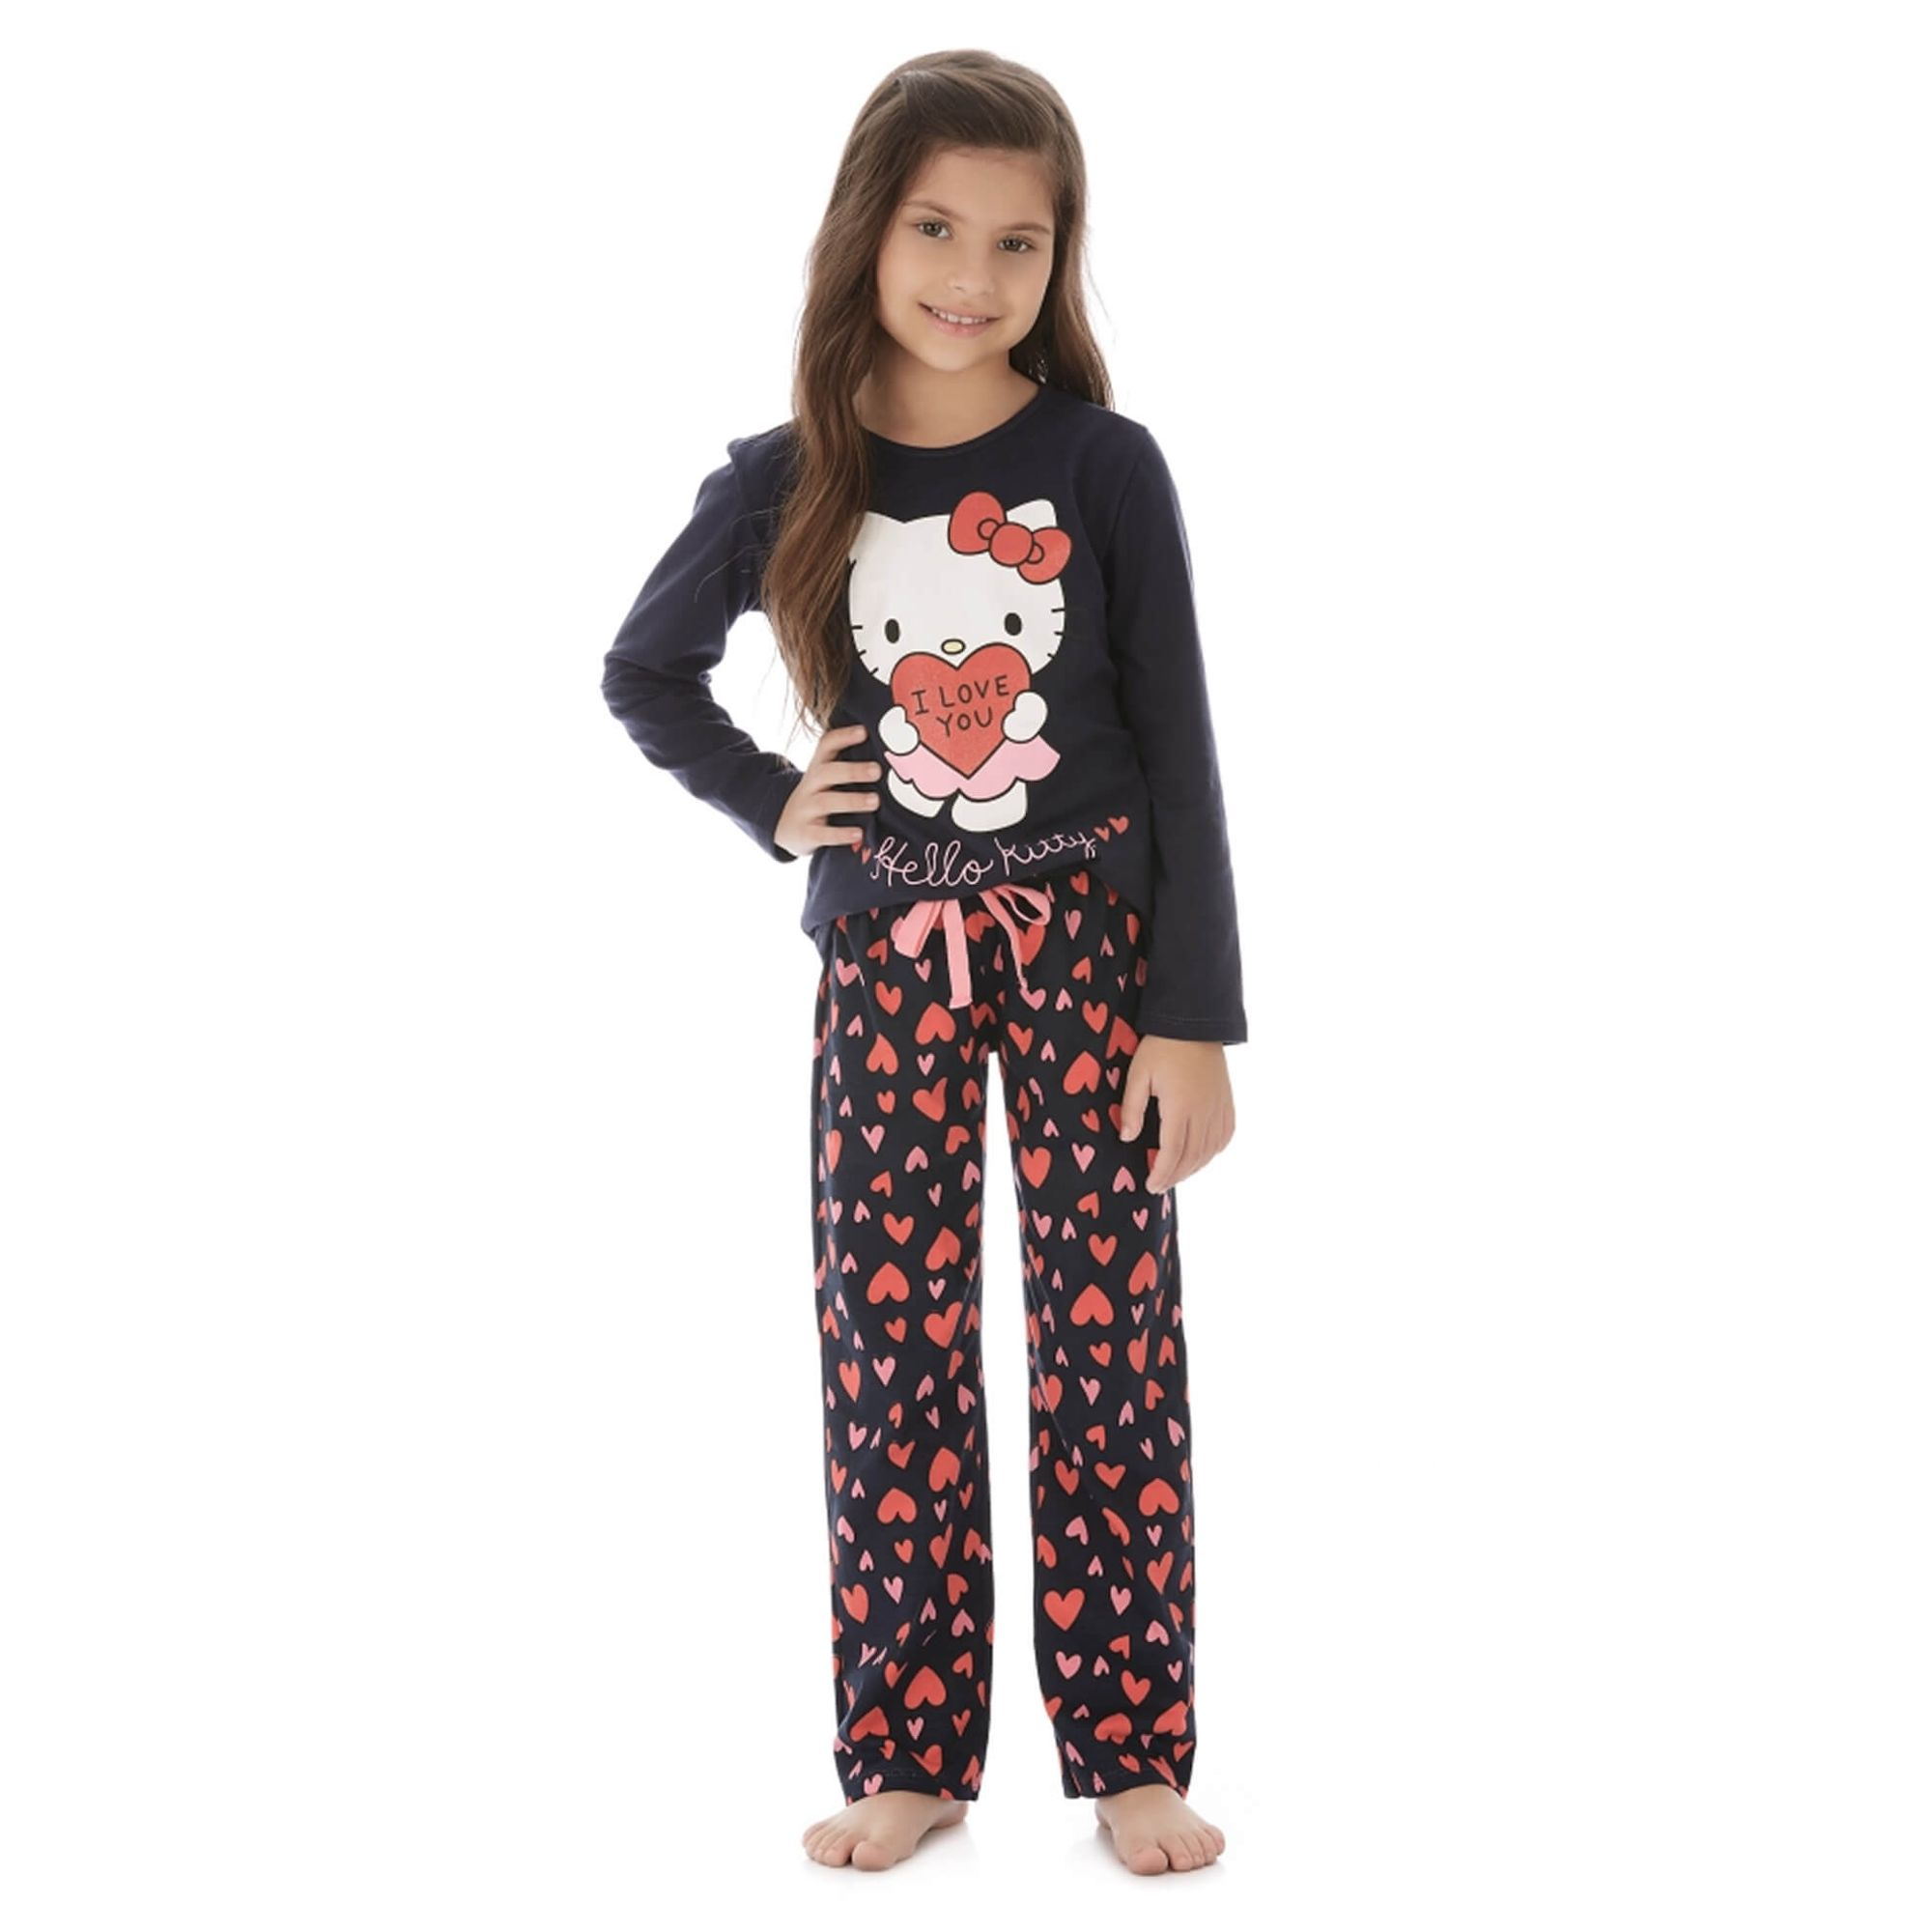 87419b738 Pijama Infantil Manga Longa Azul Marinho I Love Hello Kitty - EcaMeleca